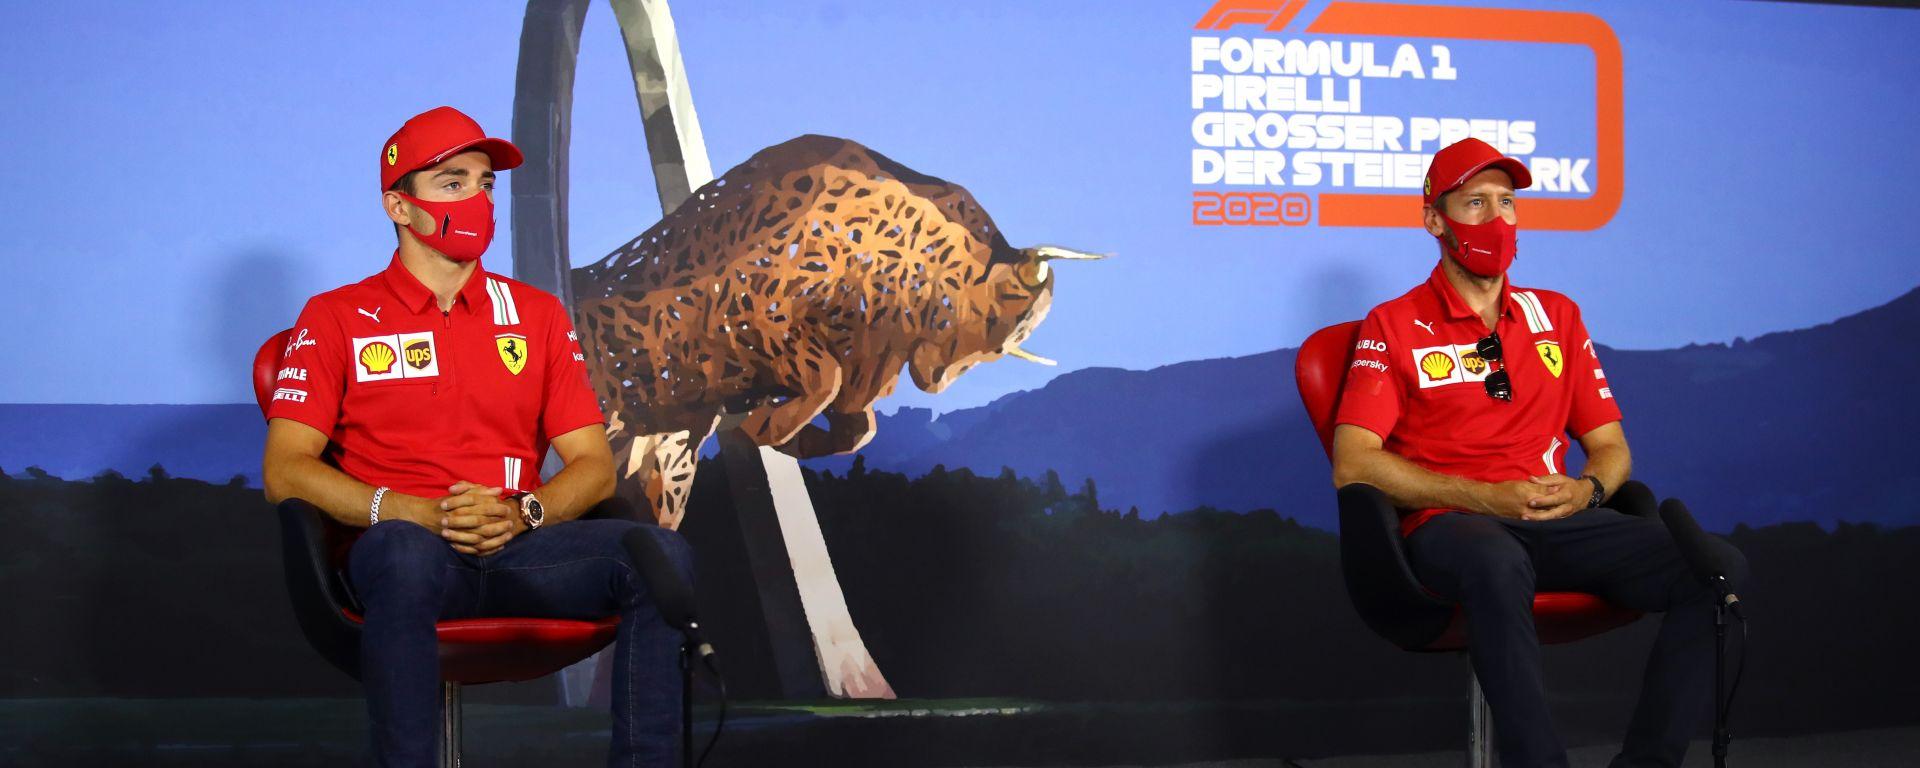 F1 GP Stiria 2020, Red Bull Ring: Charles Leclerc e Sebastian Vettel (Ferrari) in conferenza stampa